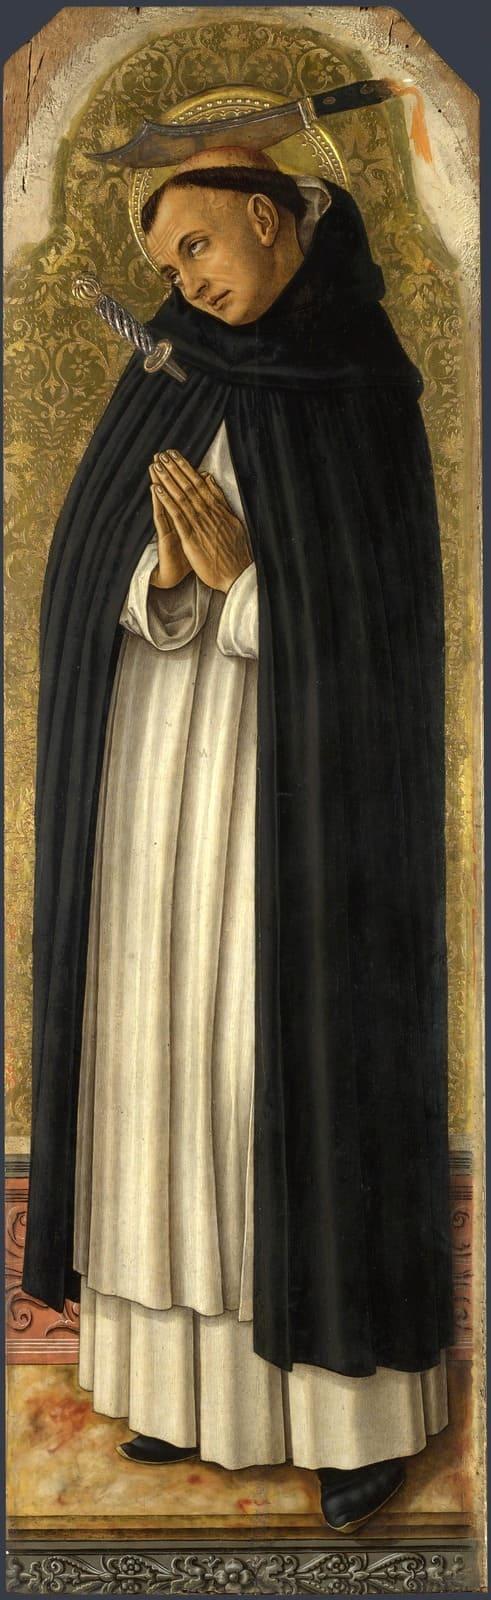 художник Карло Кривелли (Carlo Crivelli) картины – 11